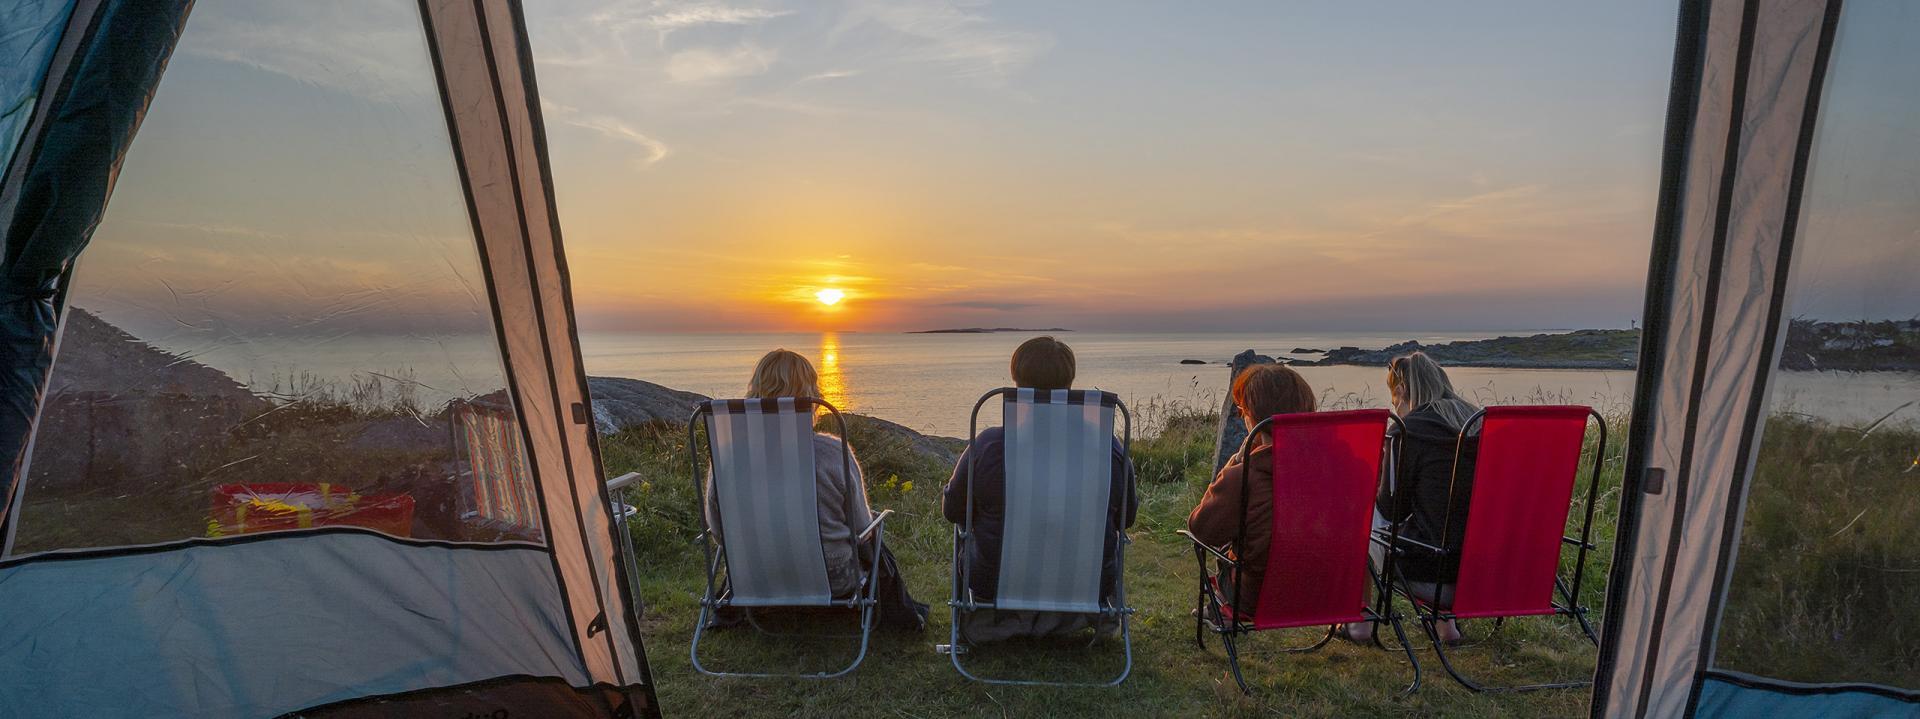 Sandhåland camping